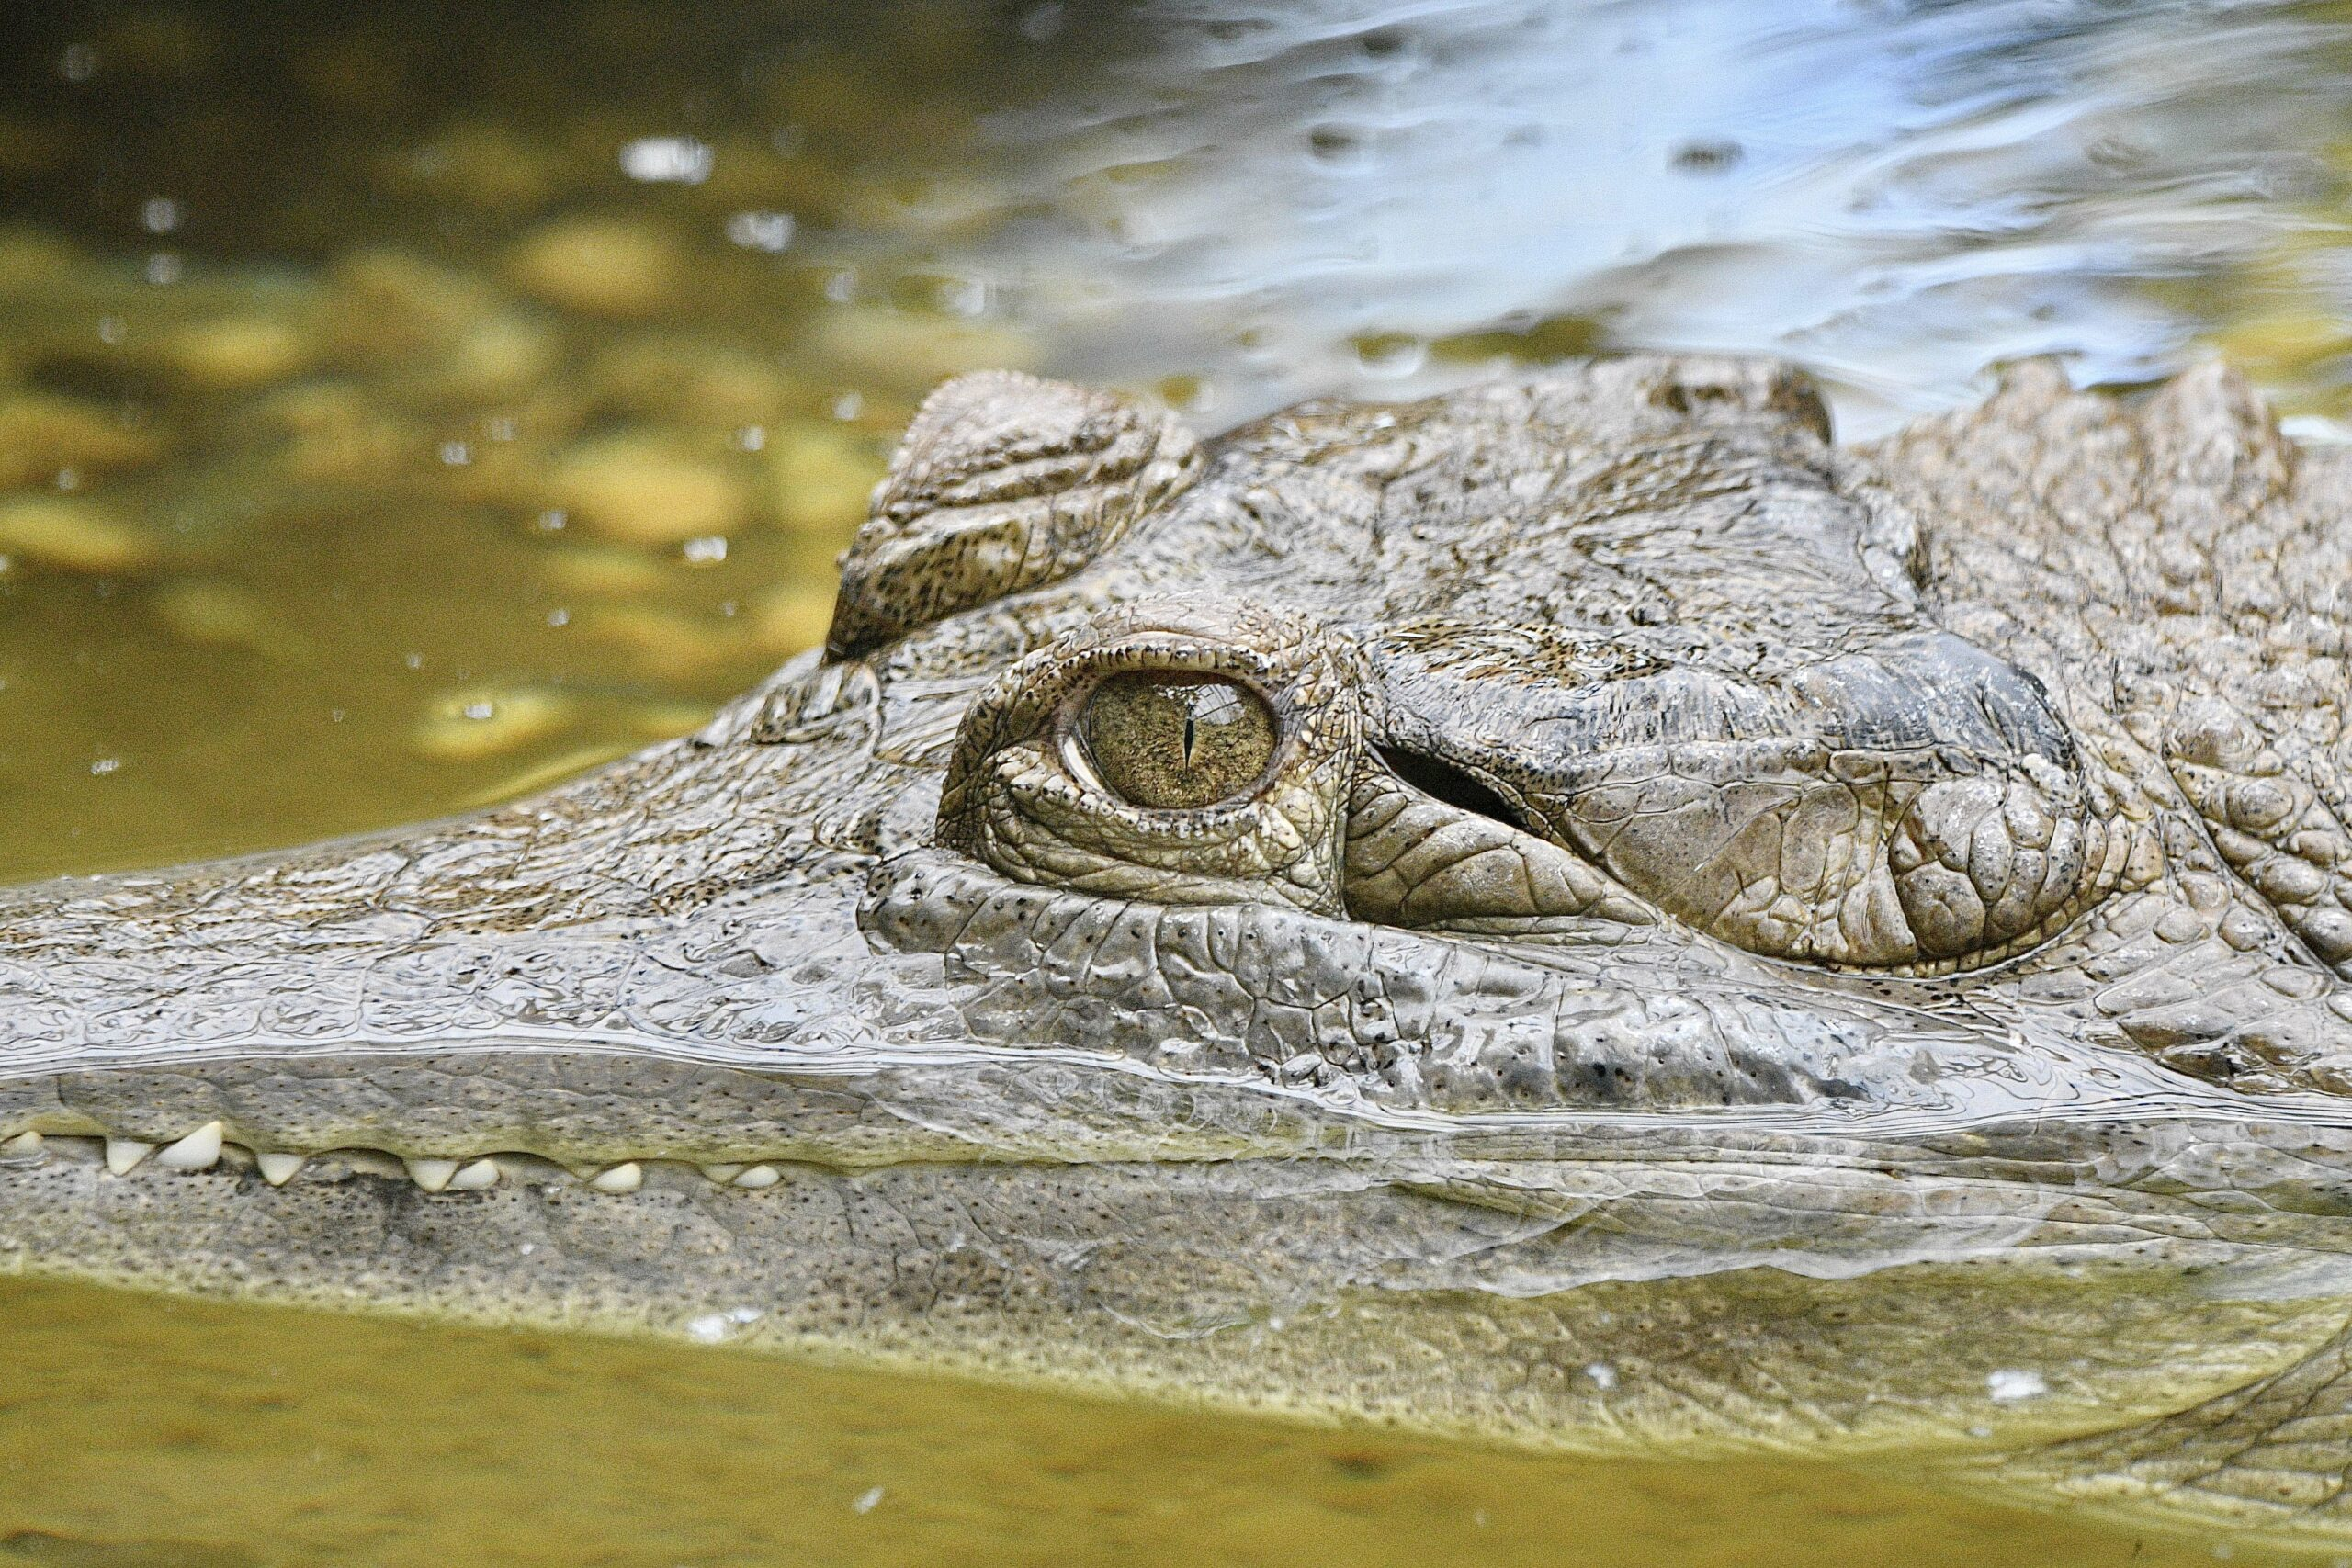 Slender-snouted Crocodile (Mecistops cataphractus)